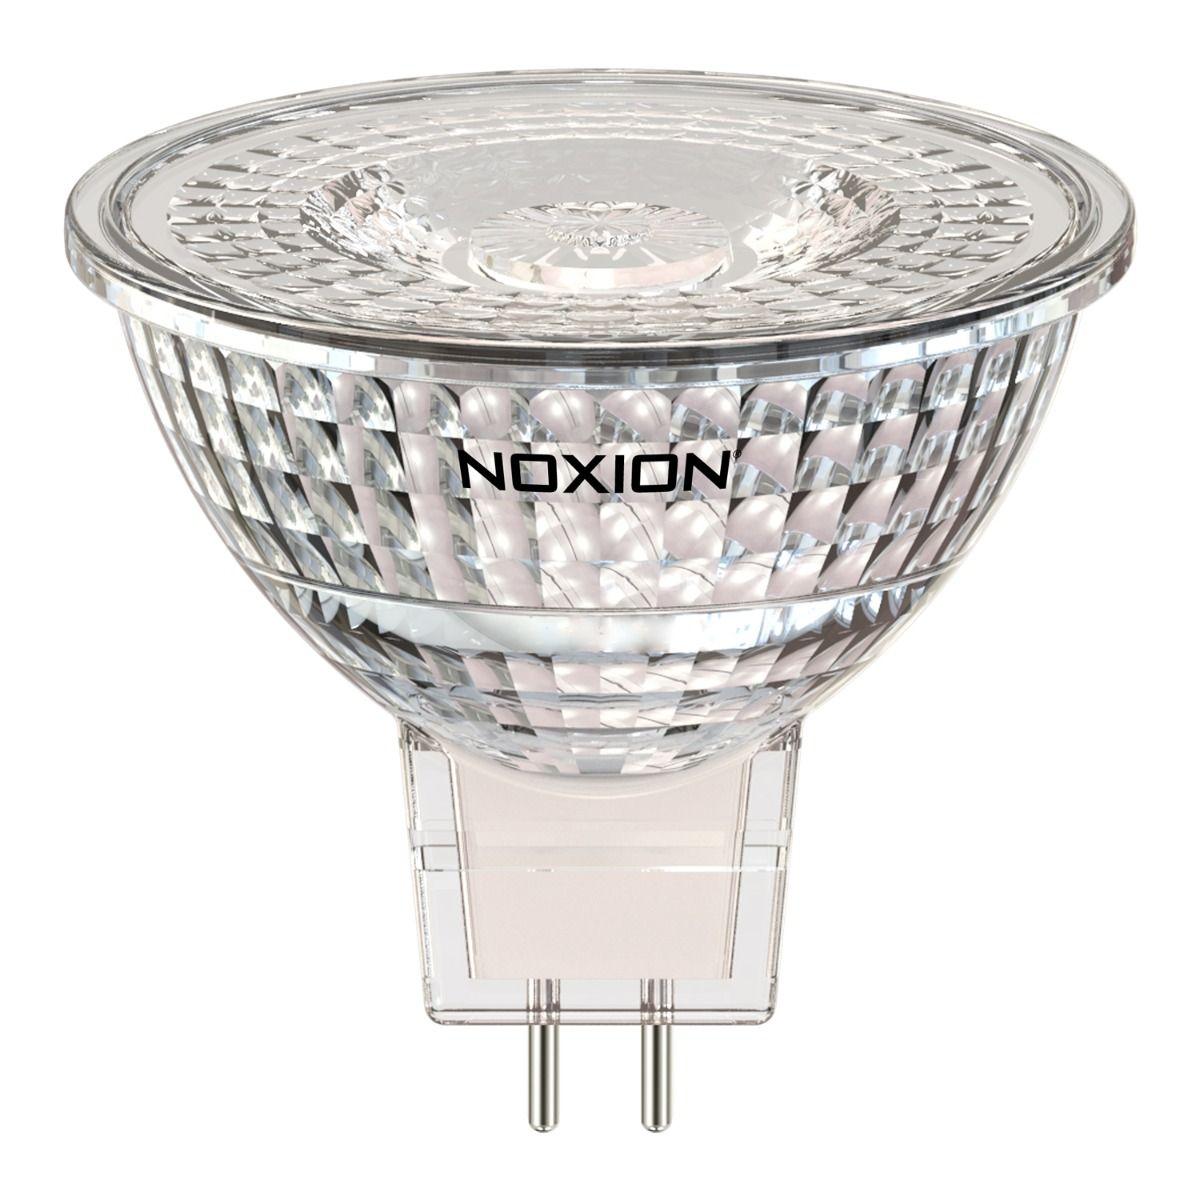 Noxion LED Spot GU5.3 4.5W 827 36D 400lm | Replacer for 35W